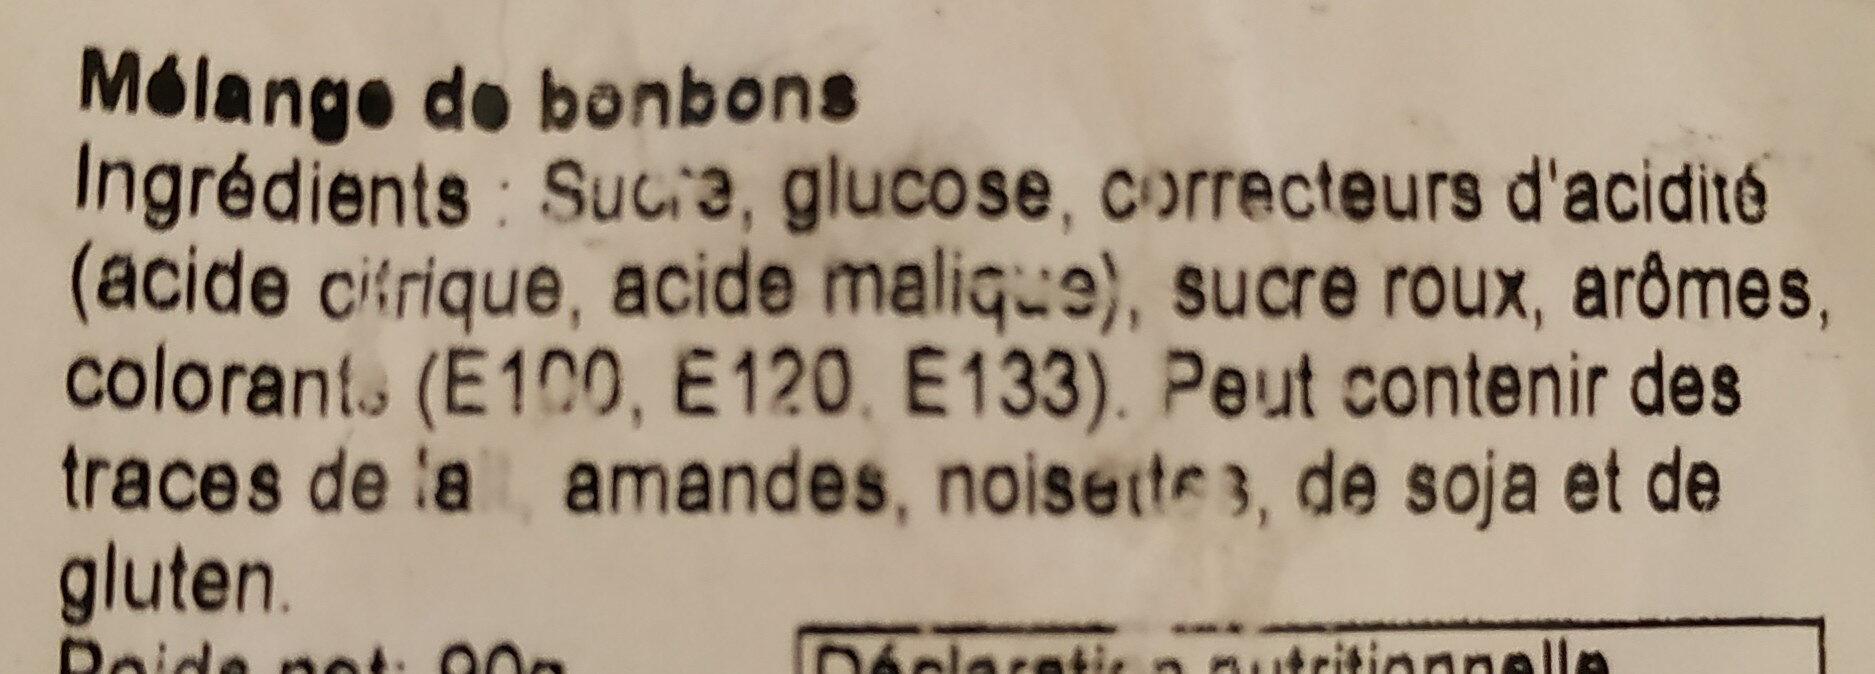 Mélange de bonbons - Ingredients - fr